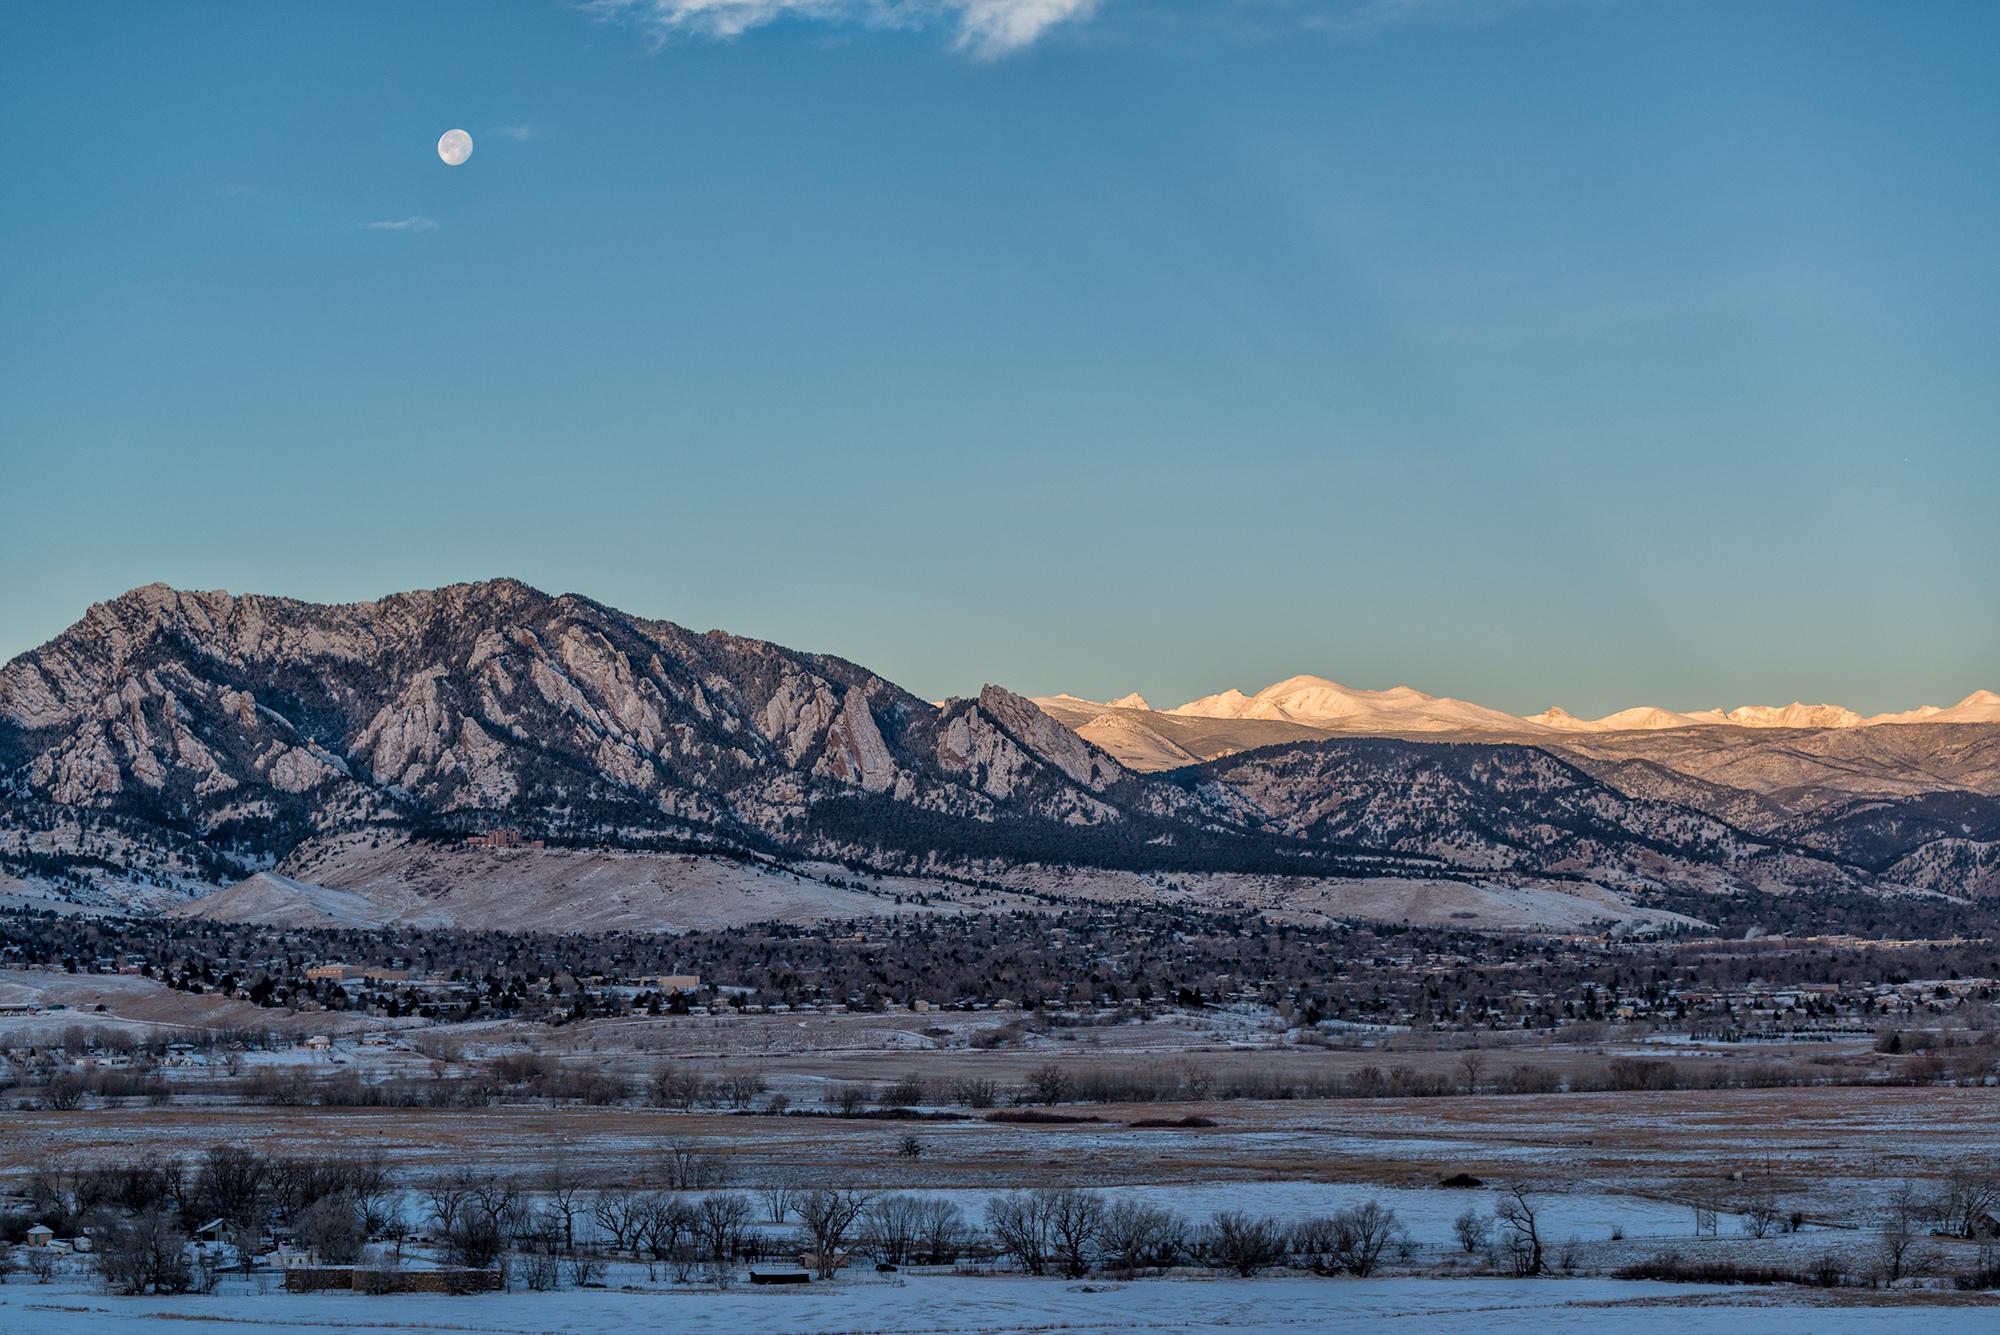 Moon Over Boulder. Boulder, Colorado, 2015